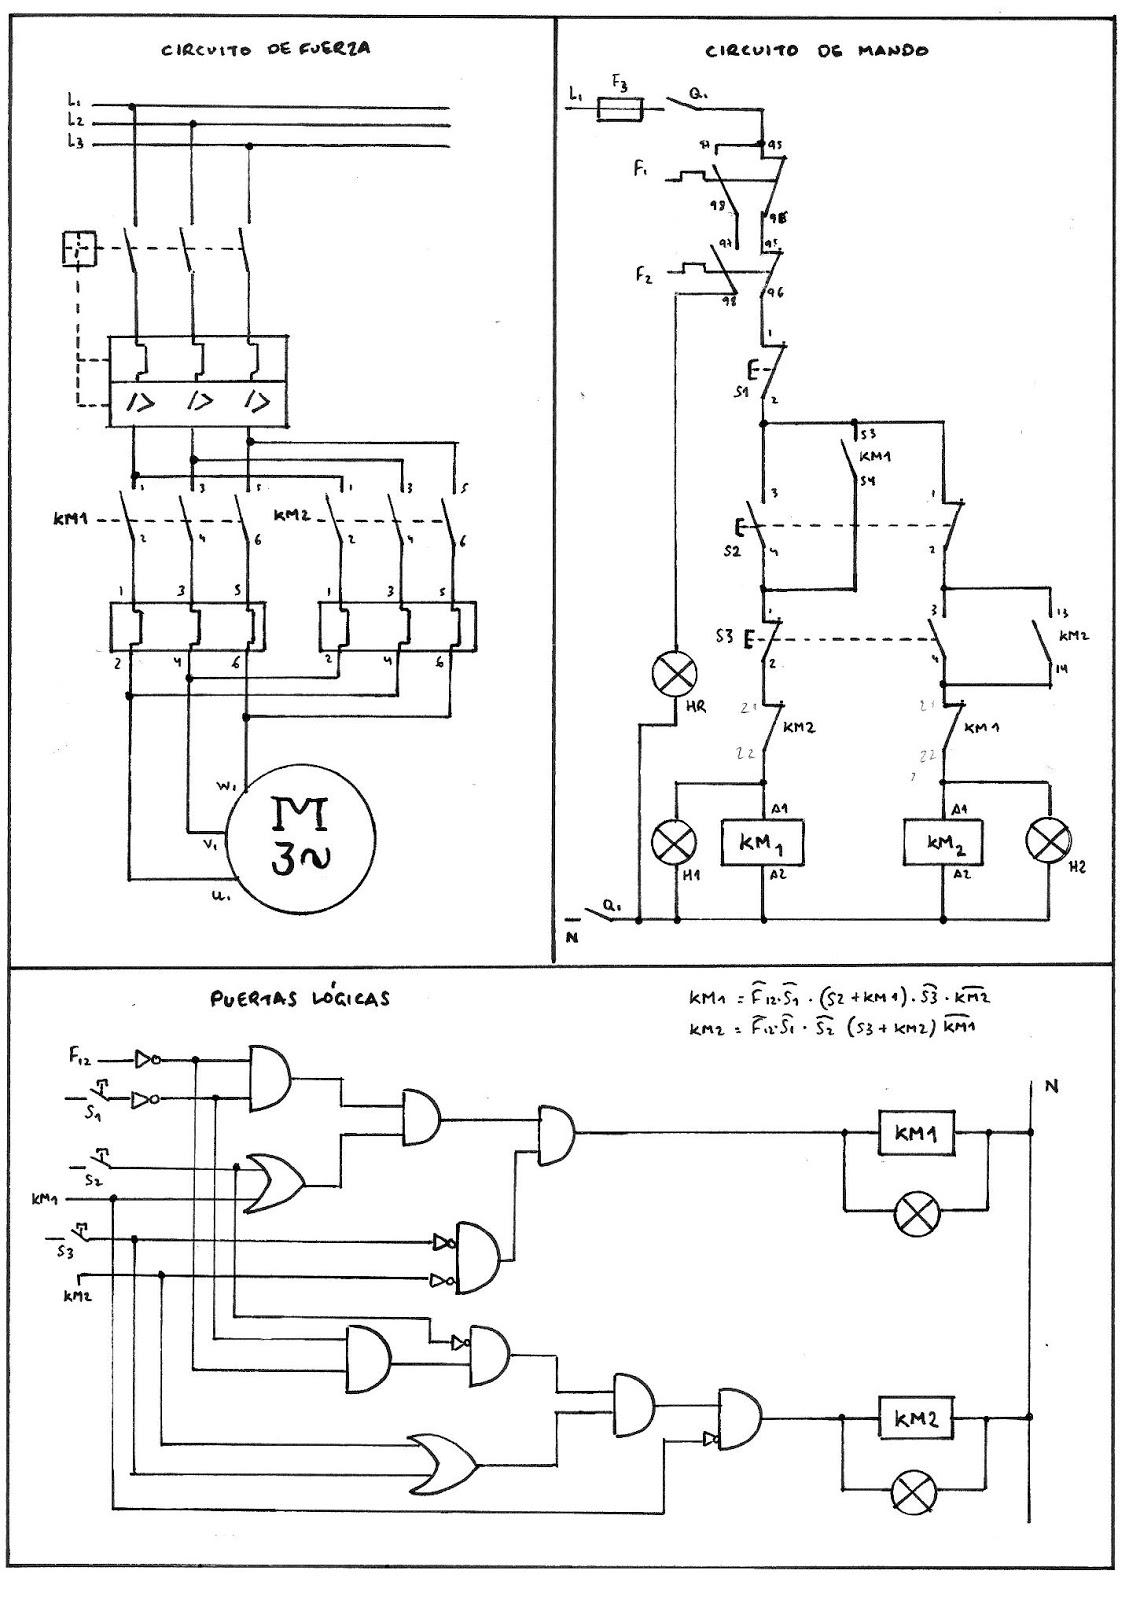 Practica 3 3 Inversion Giro Motor Iii Asincrono